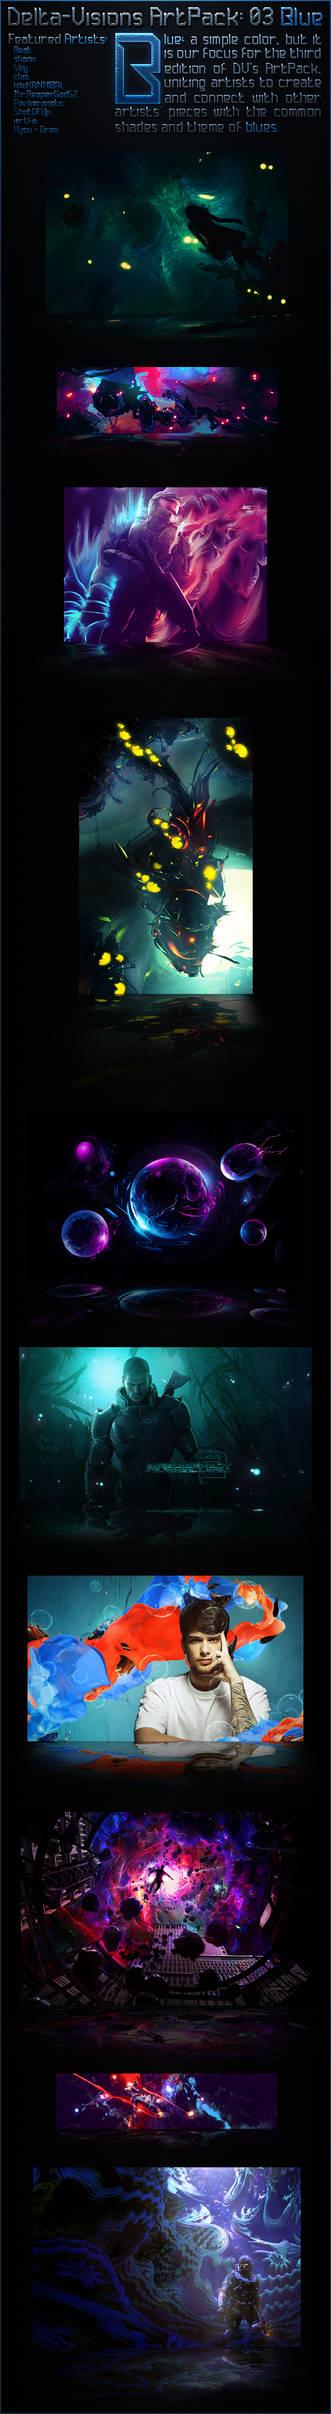 Delta-Visions ArtPack 3